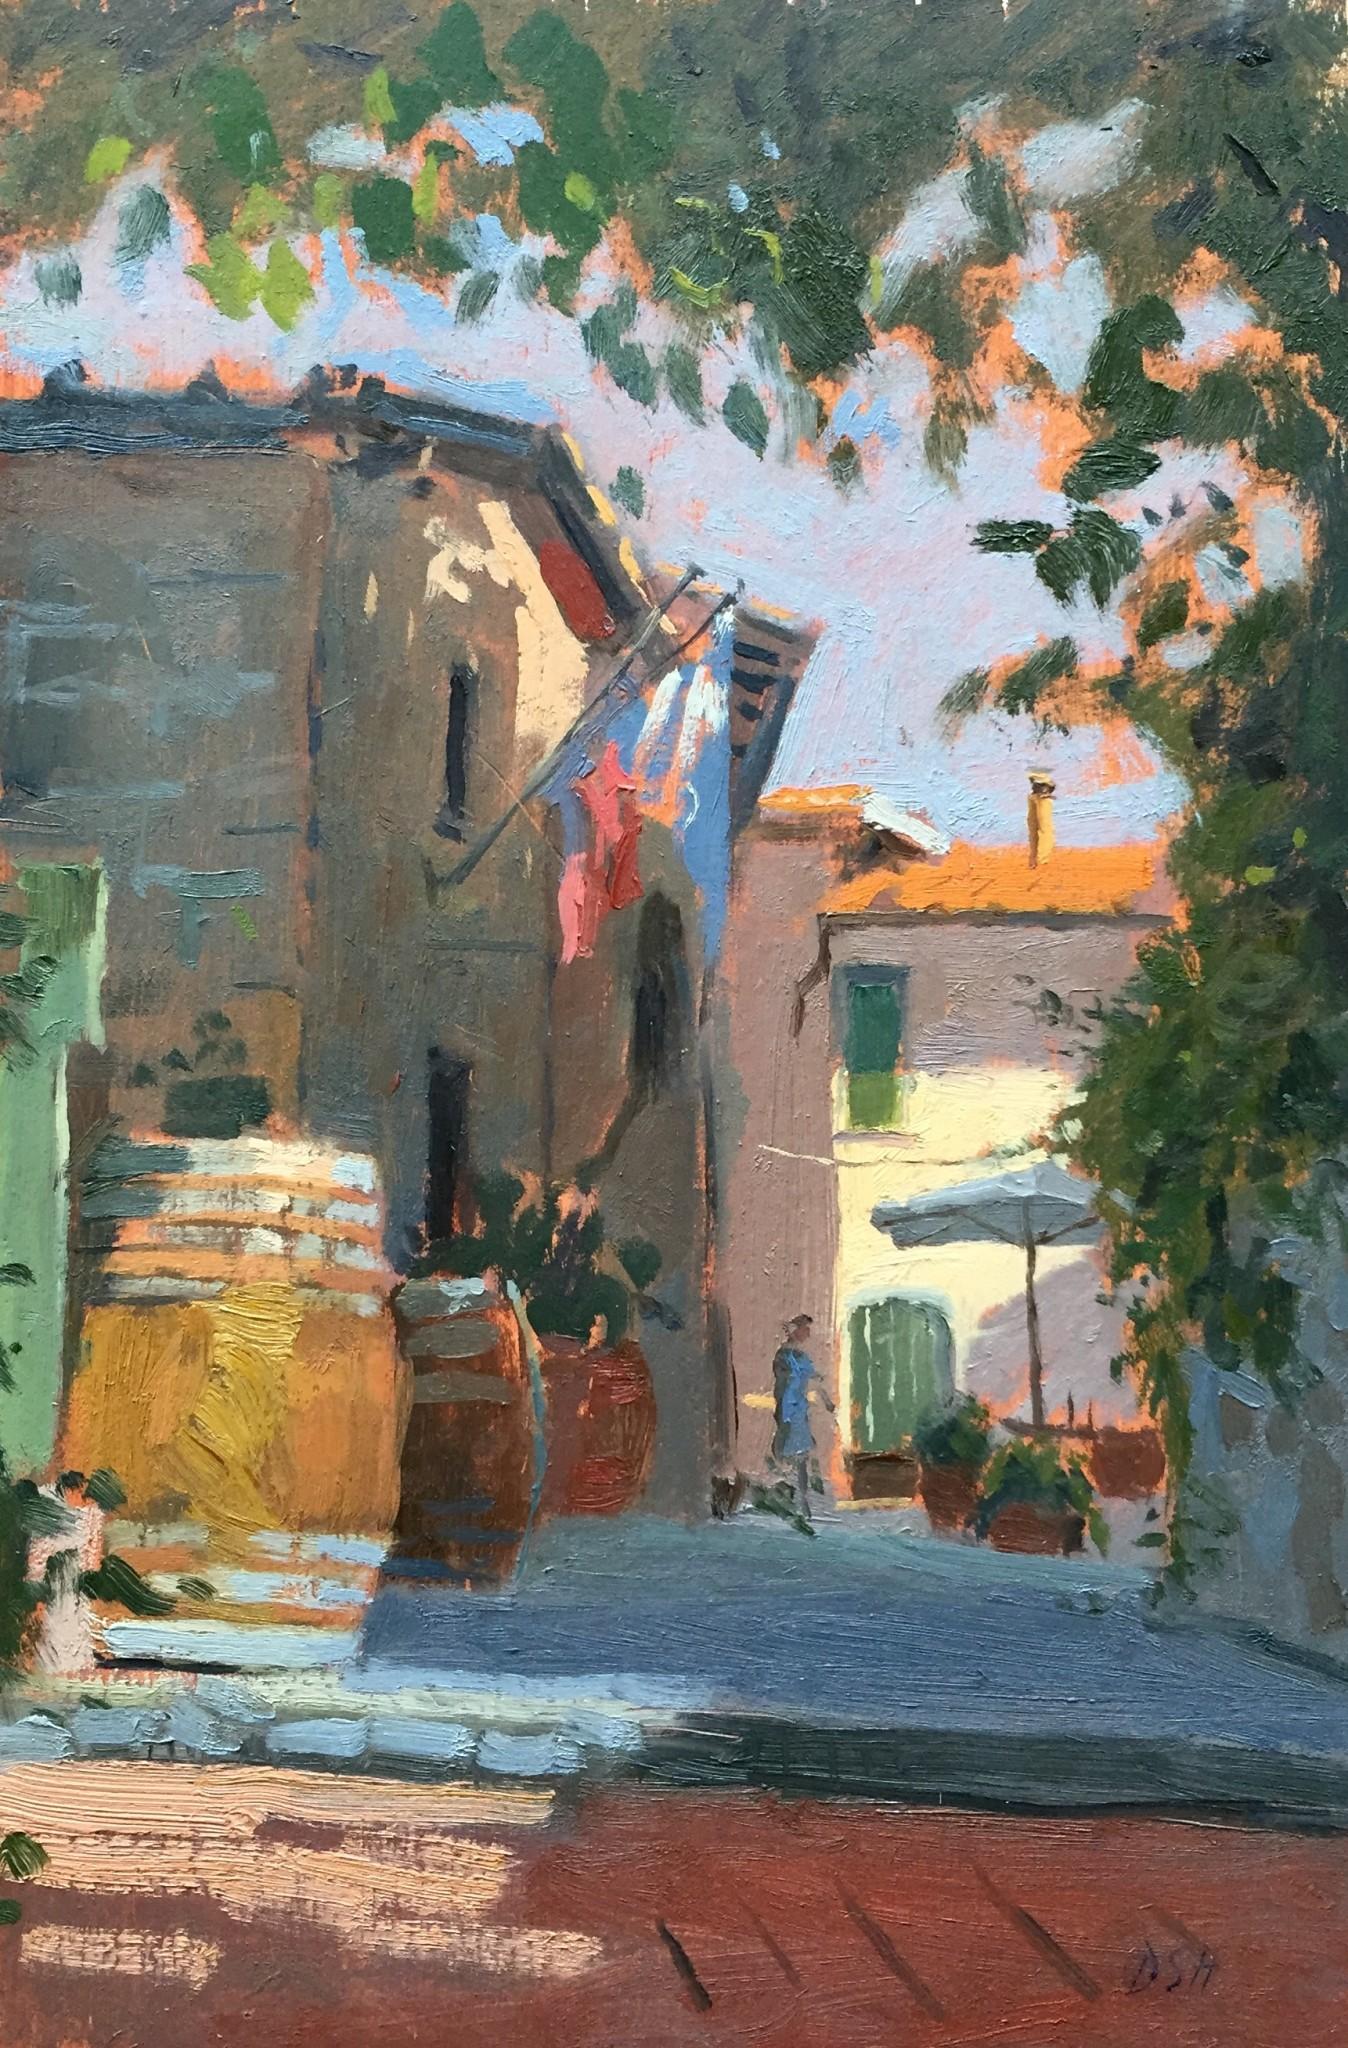 Afternoon Light, Panzano in Chianti